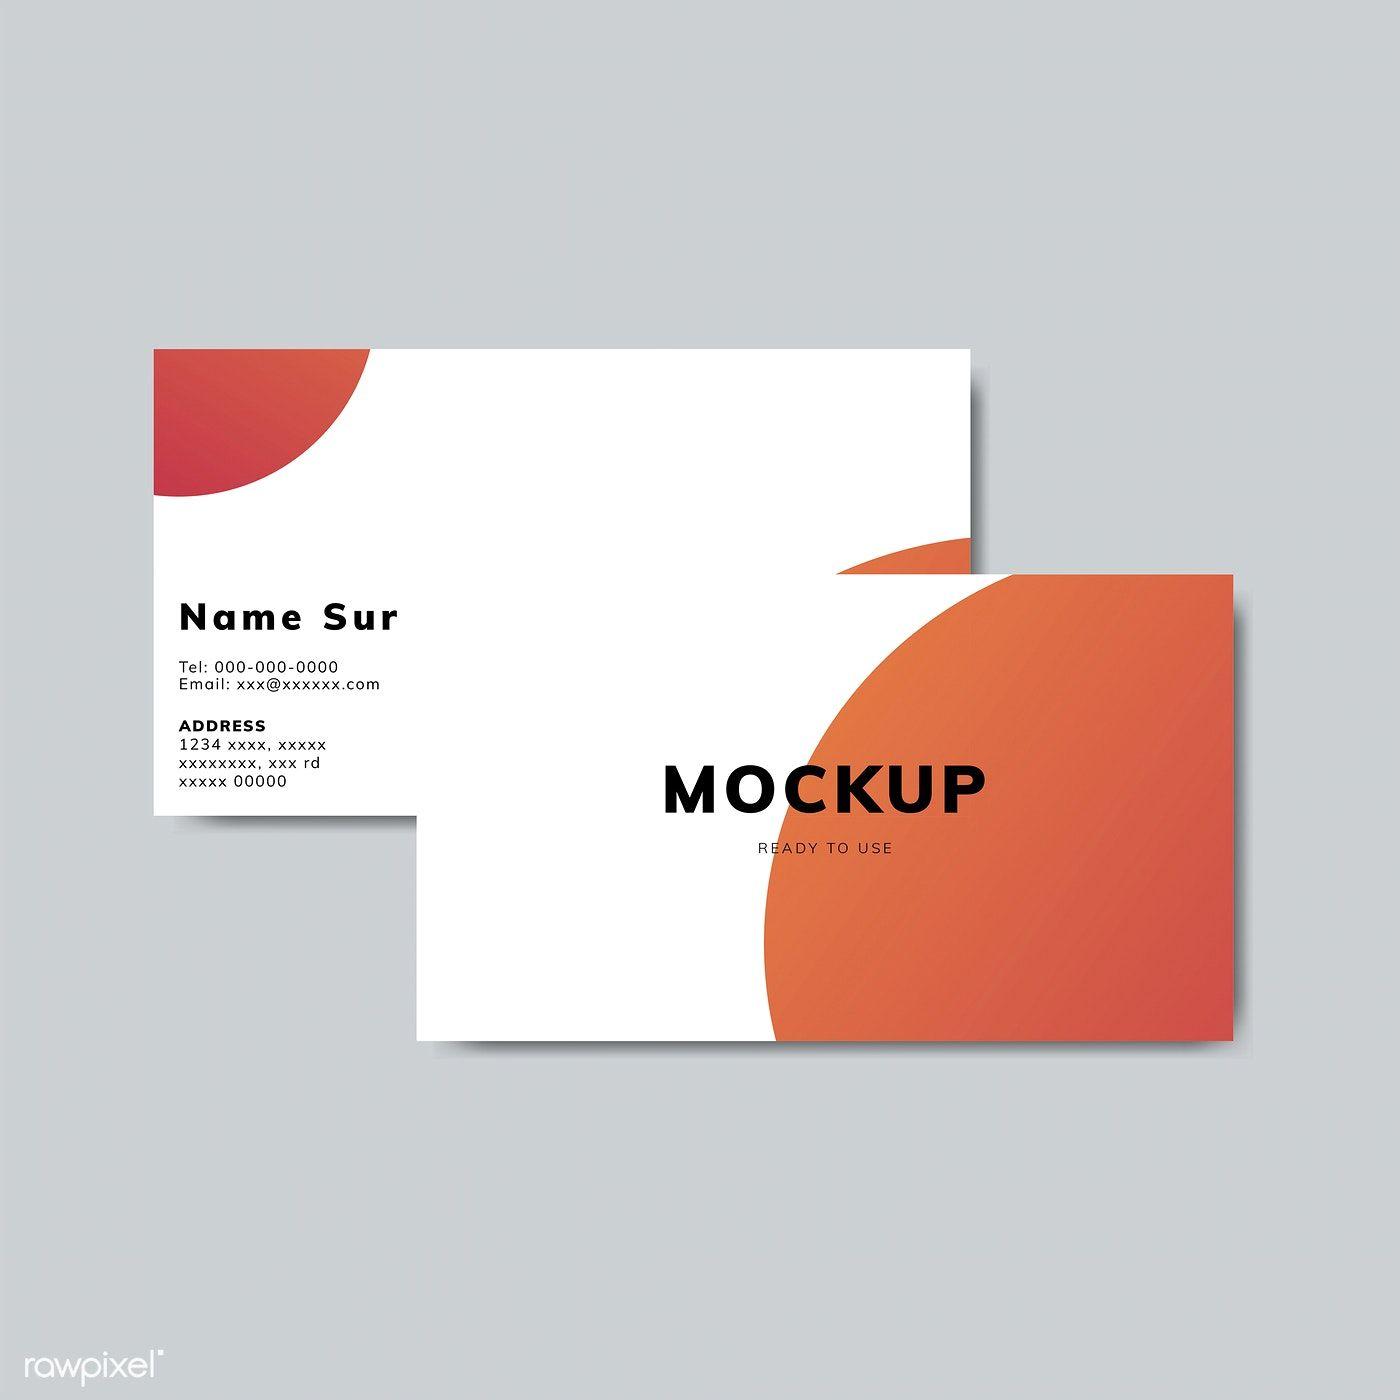 Download Premium Illustration Of Simple Business Card Design